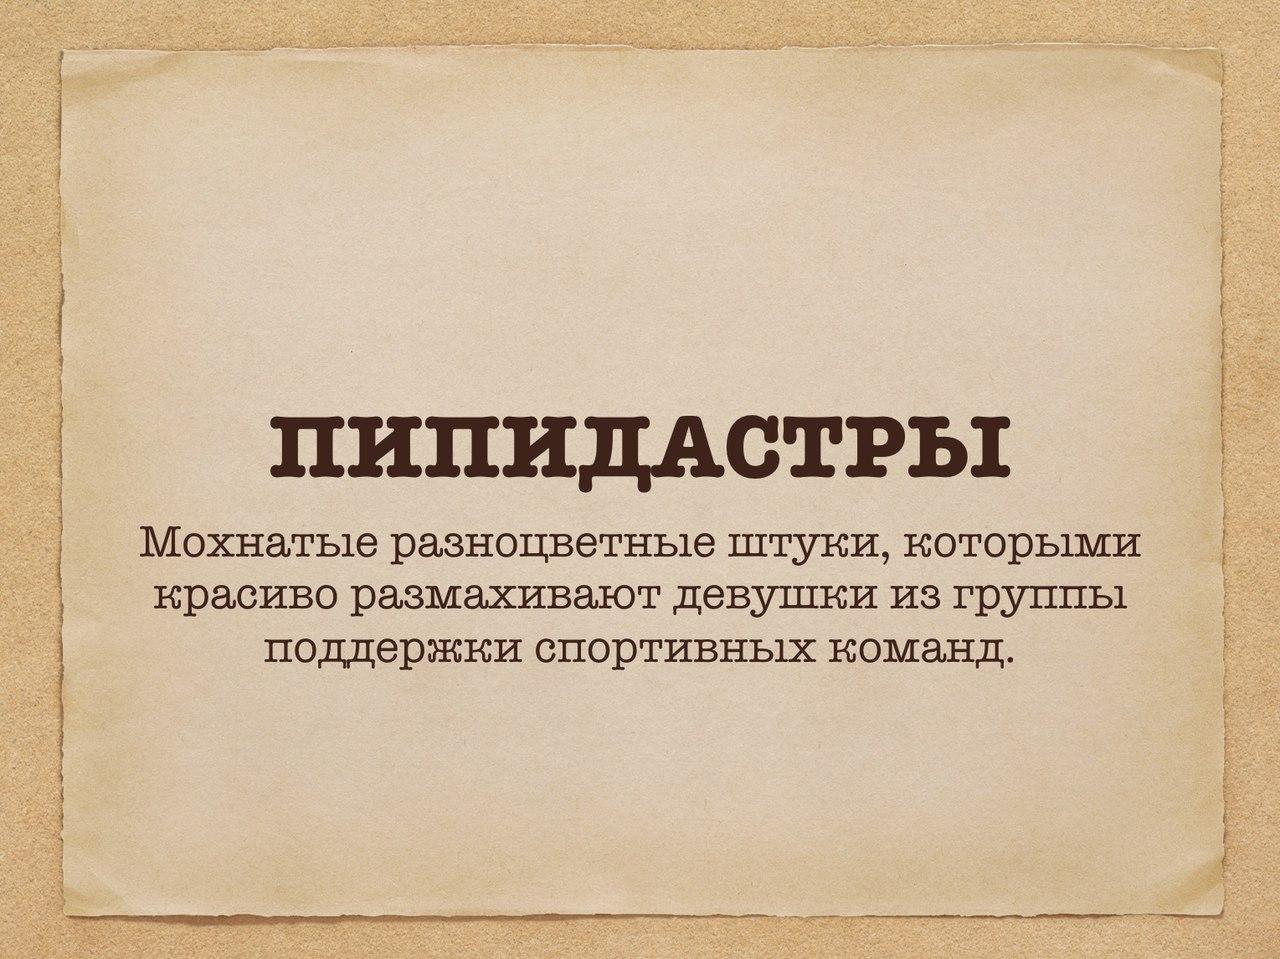 https://pp.userapi.com/c849232/v849232528/ca79/sXlR708P2lE.jpg